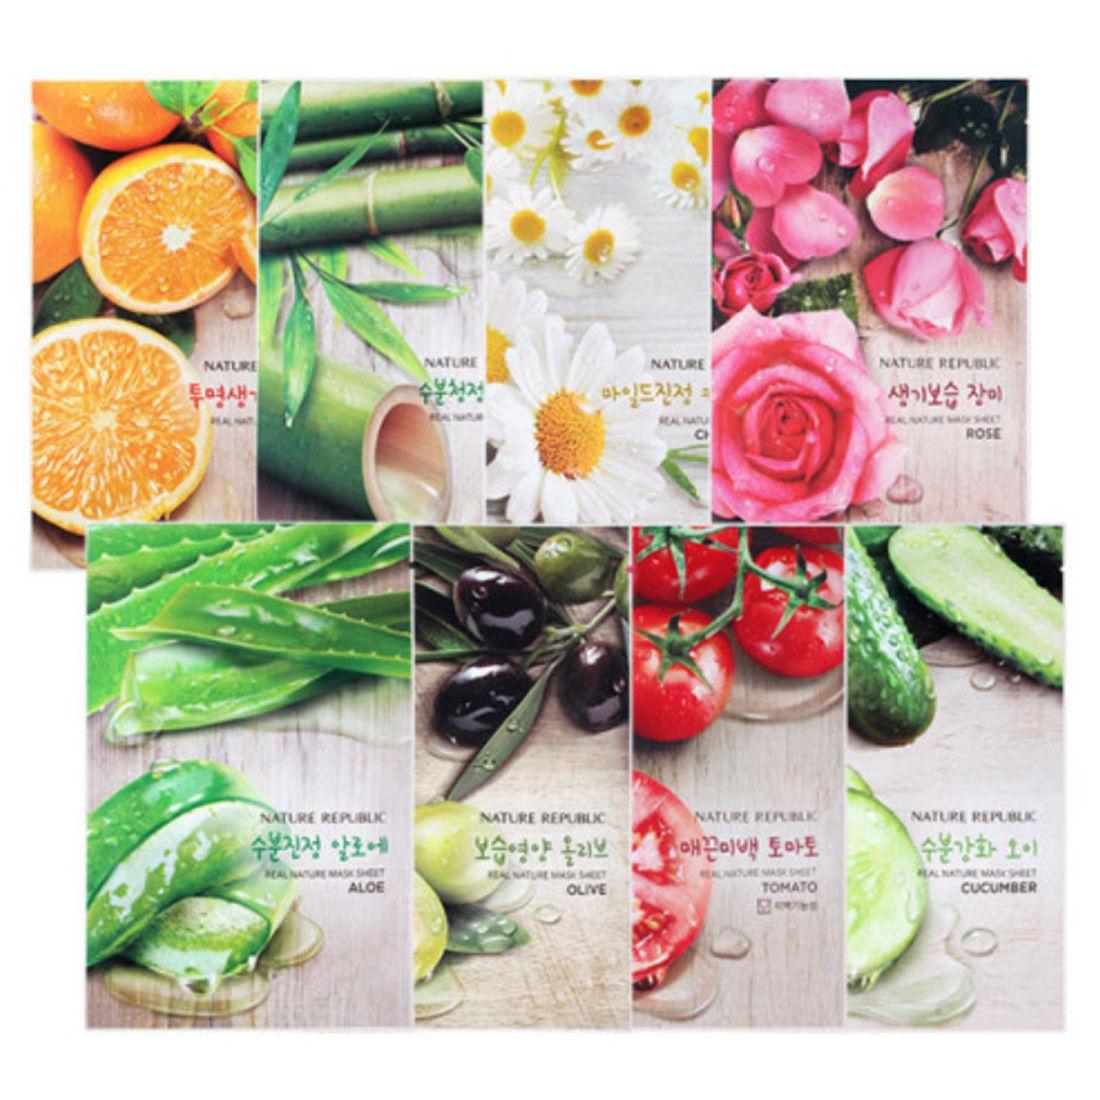 Best Korea Cosmetic Tosowoong Pure Mask Pack 12pcs Face Acne Secret Key Nature Recipe Tea Tree 20g 3pcs Republic Real Sheet Randomly 10pcs Hyaluronic Acid Facial Shrink